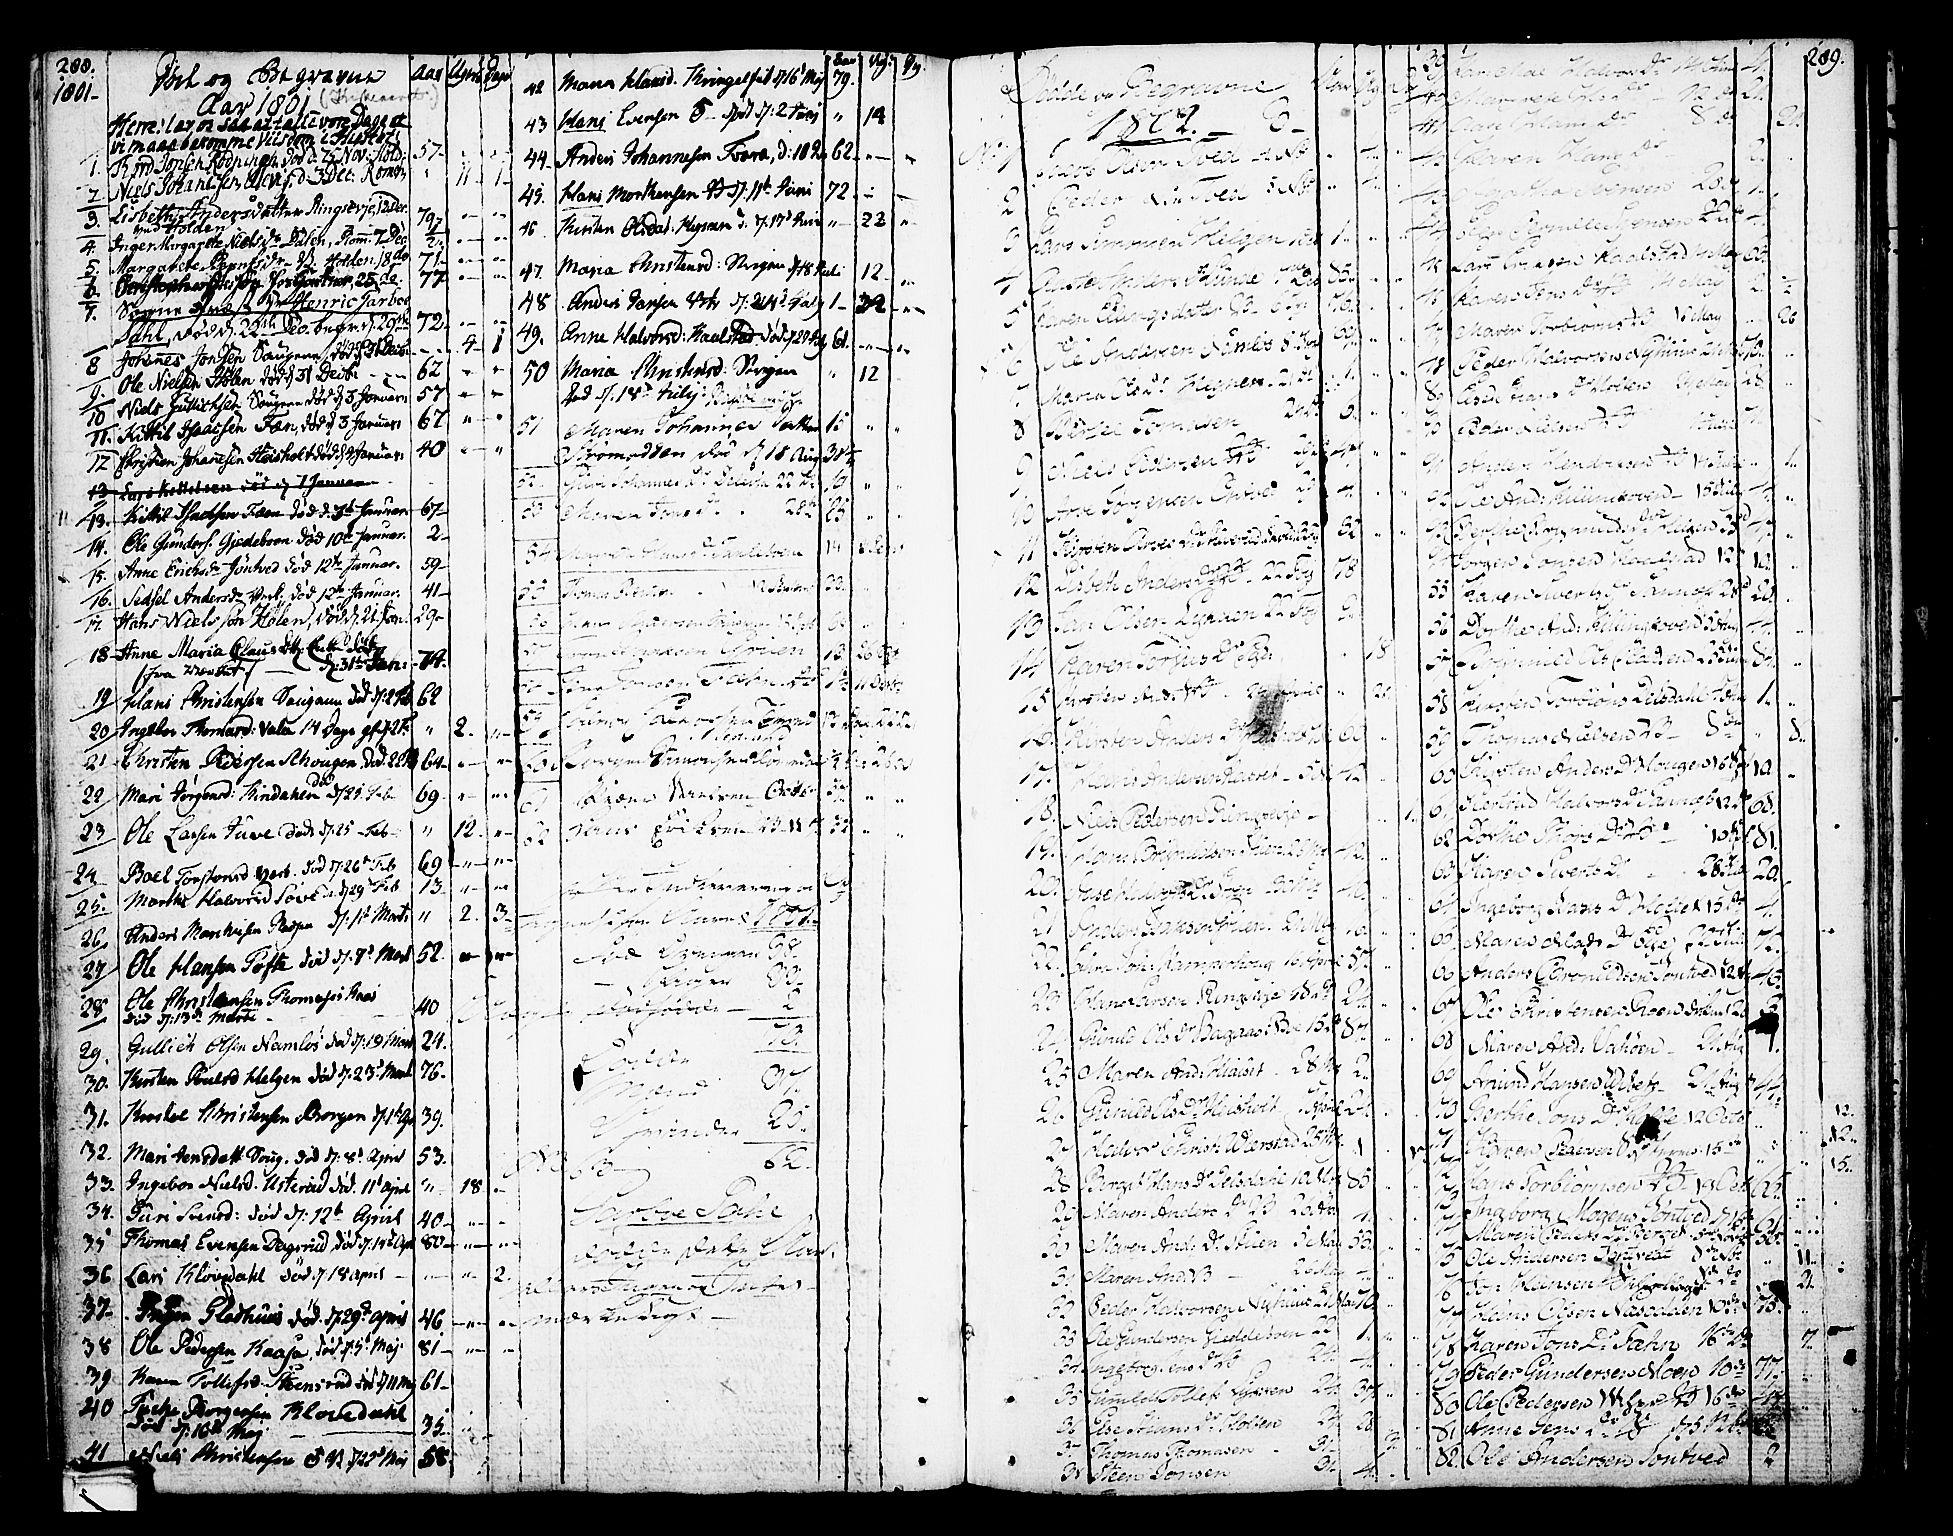 SAKO, Holla kirkebøker, F/Fa/L0002: Ministerialbok nr. 2, 1779-1814, s. 288-289